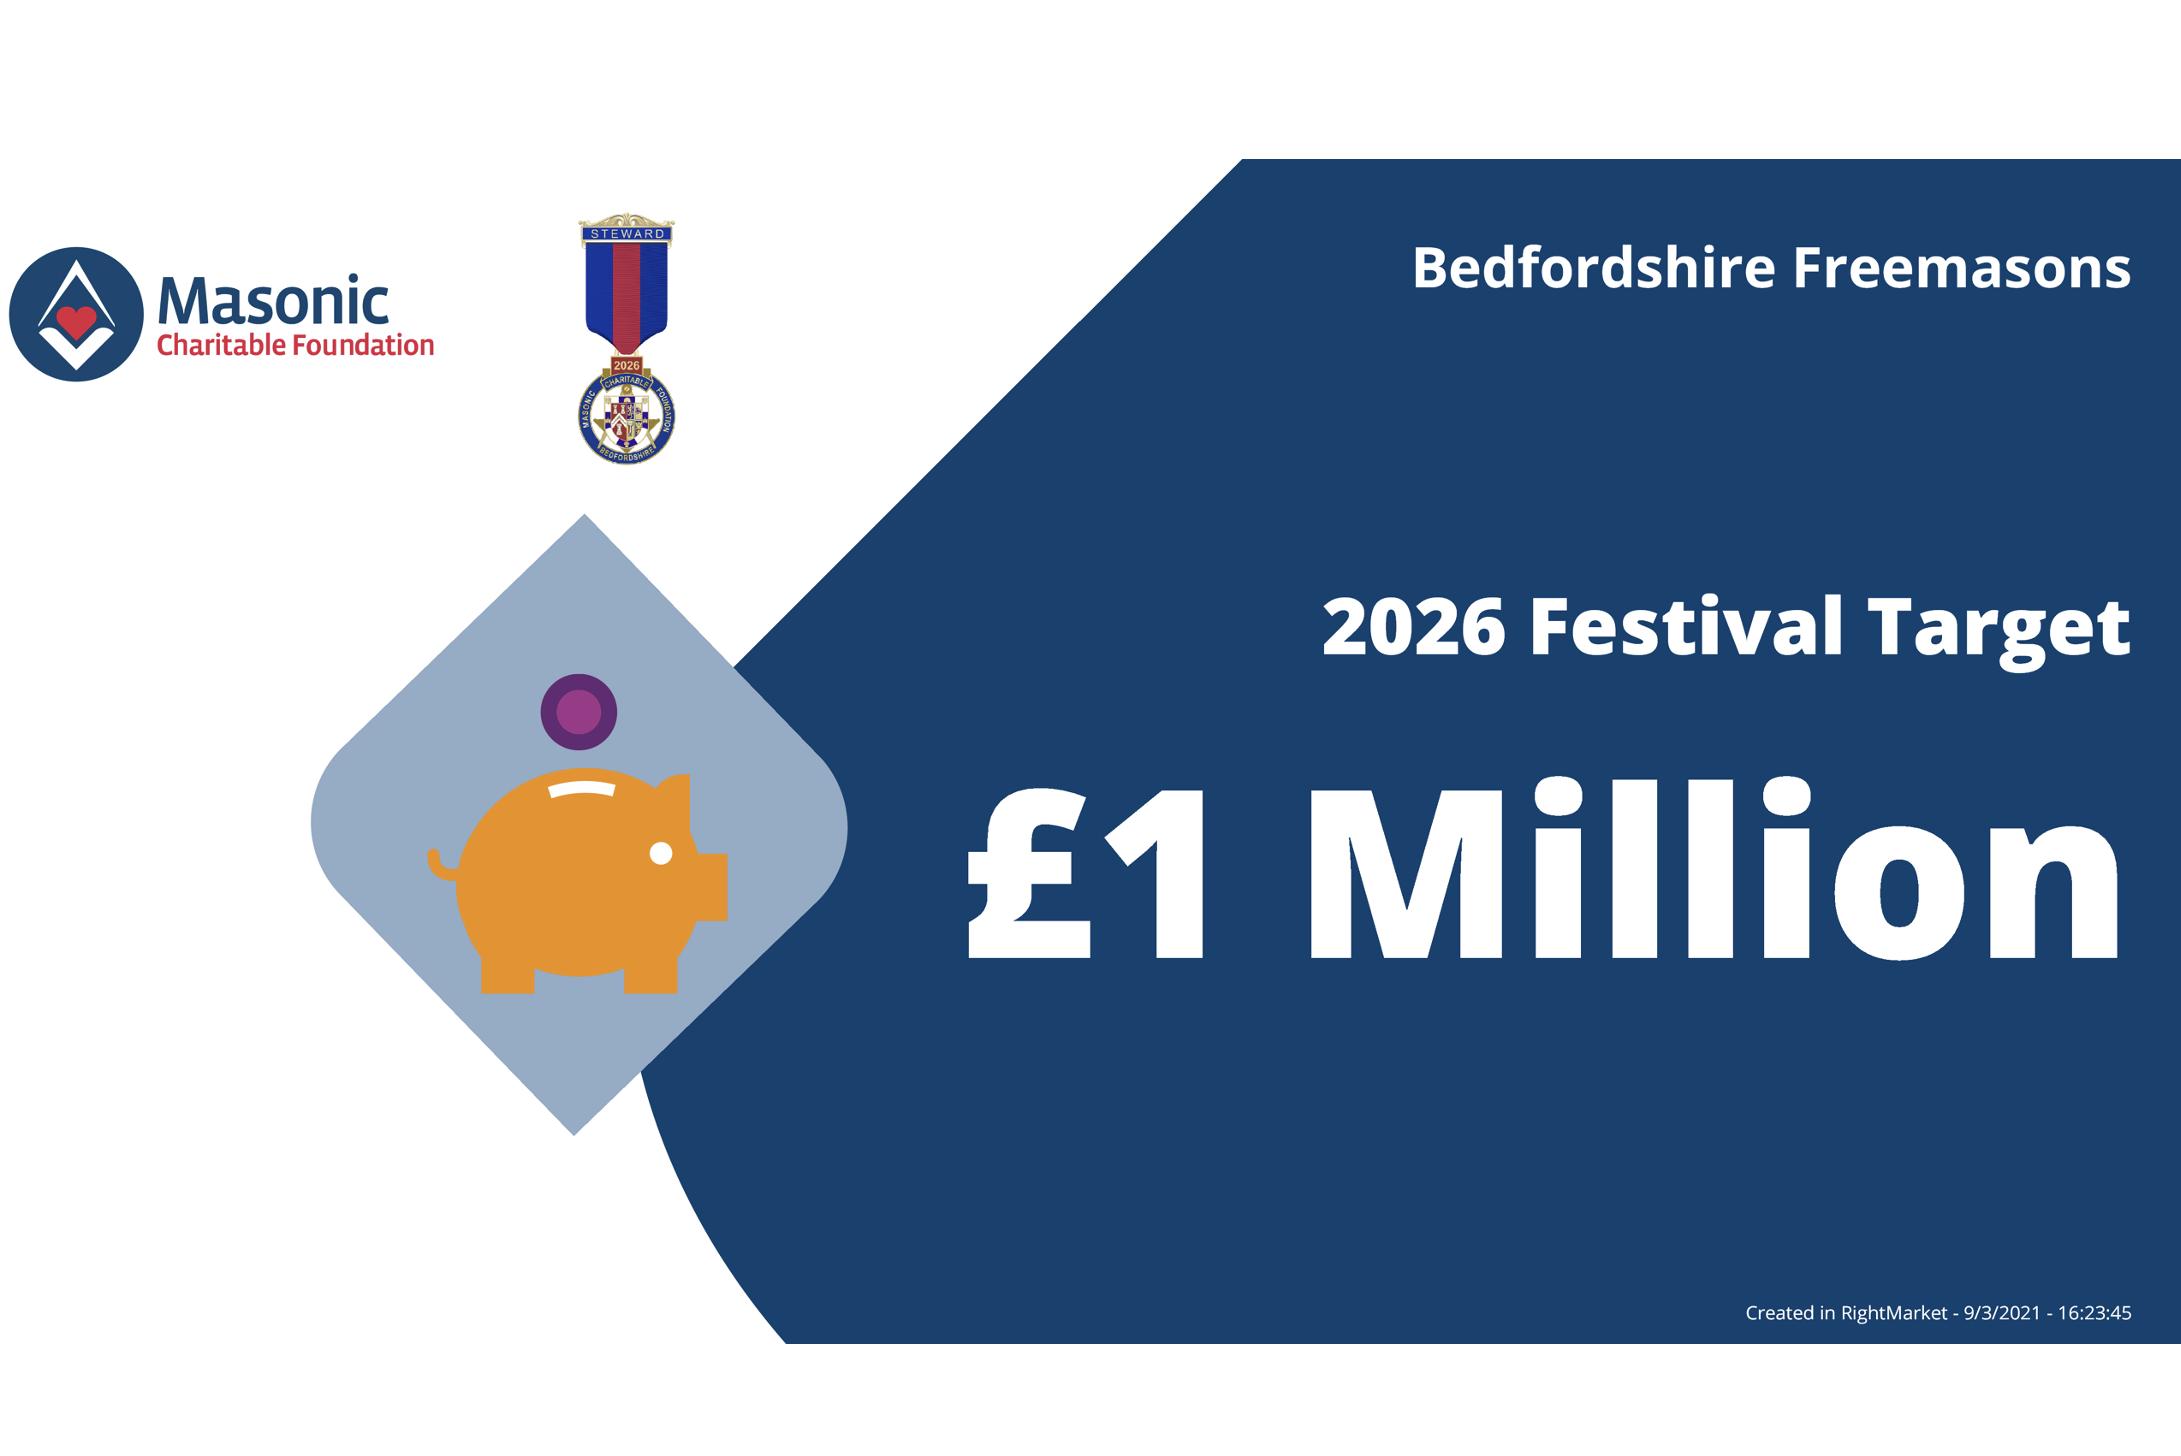 Bedfordshire Set £1 Million Festival Target